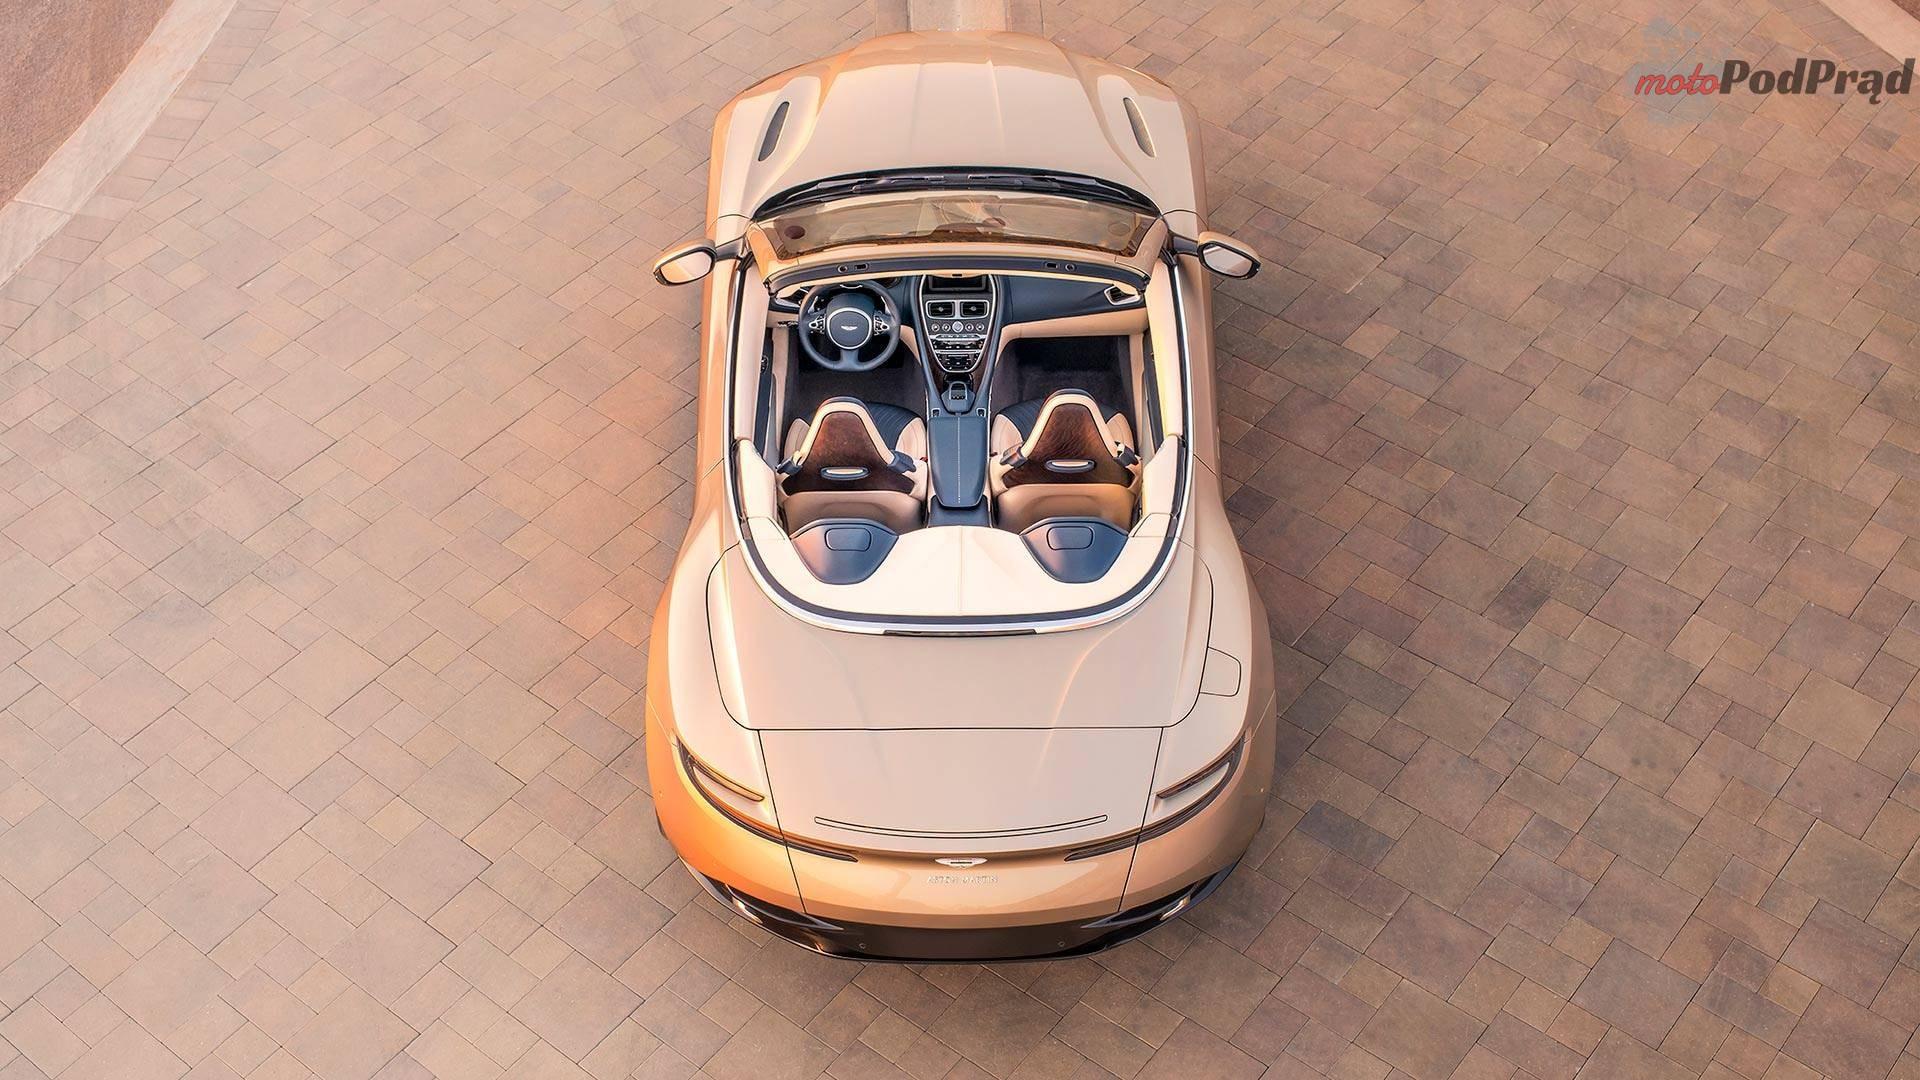 aston martin db11 volante 1 Aston Martin BD11 Volante   klasyka gatunku